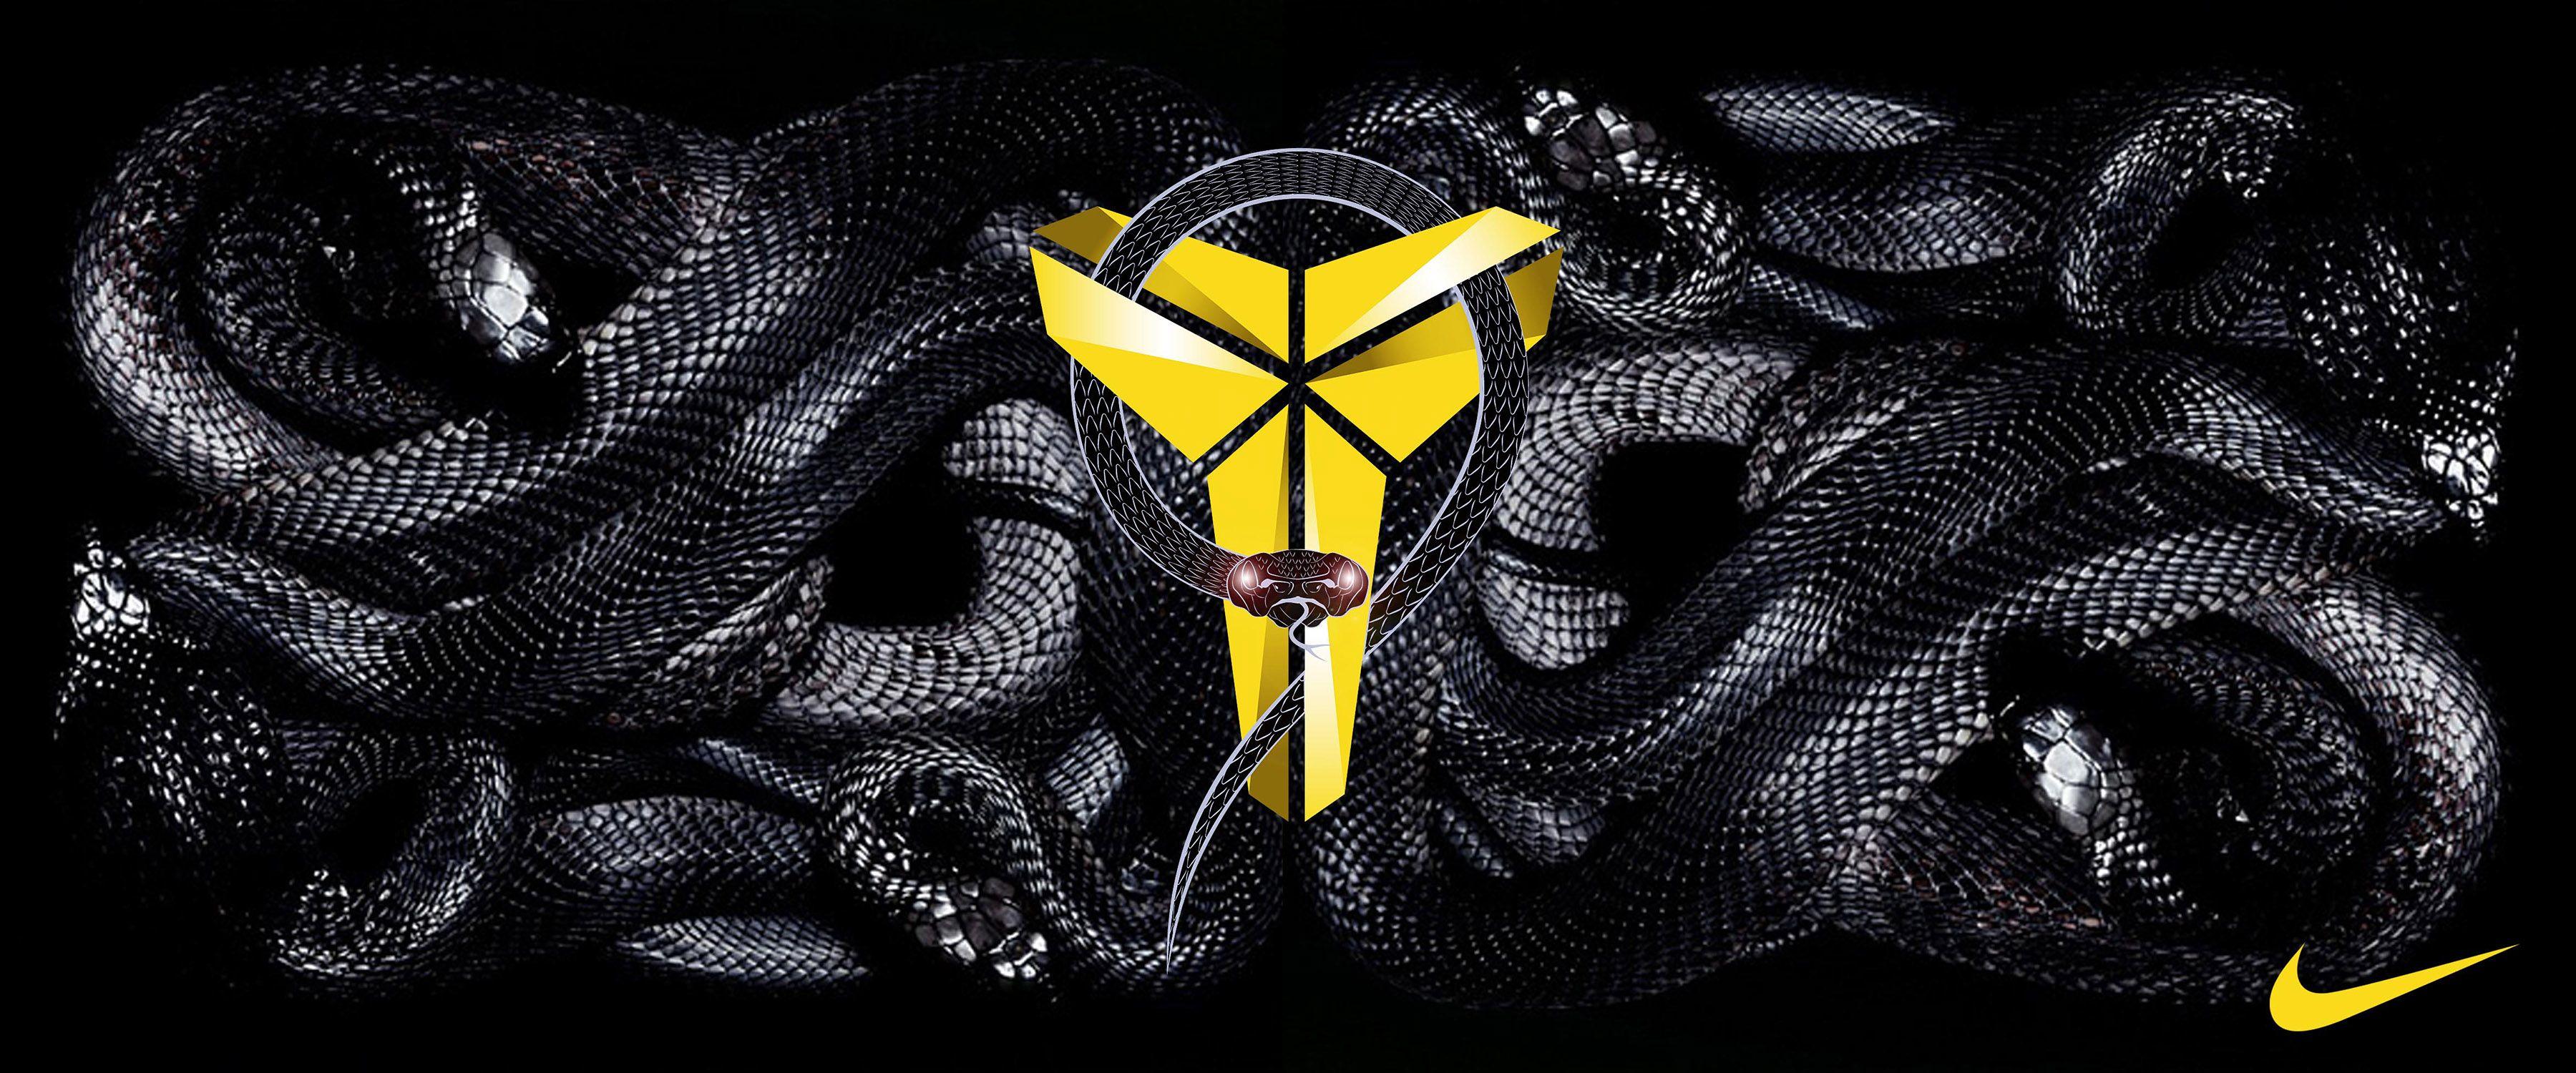 LA Lakers Kobe Bryant, Black Mamba LA Lakers